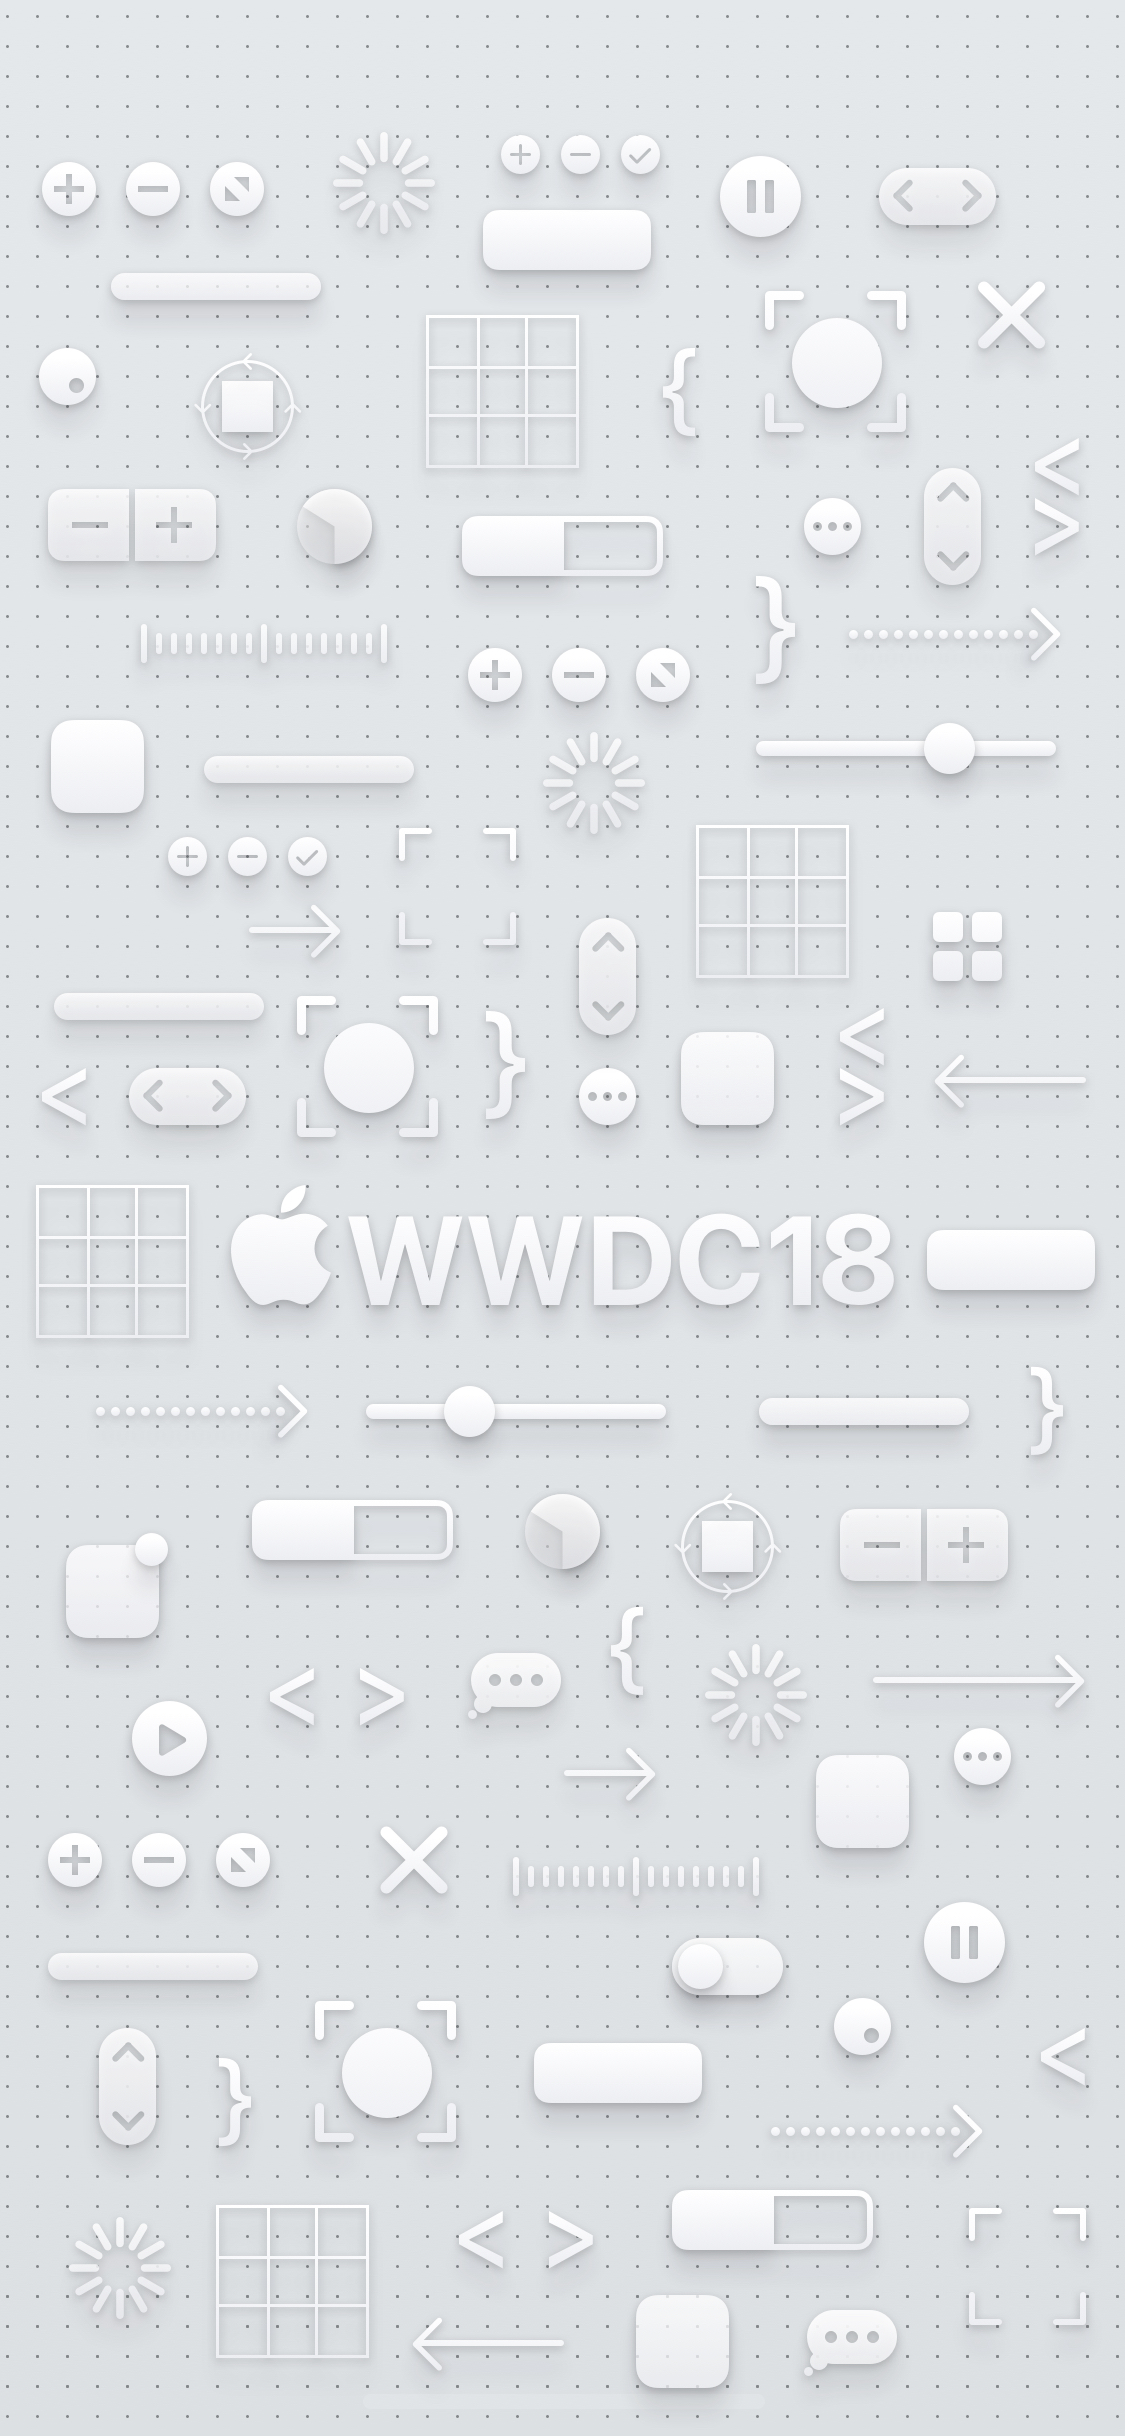 WWDC 2015 - WWDC 2019 壁纸合集